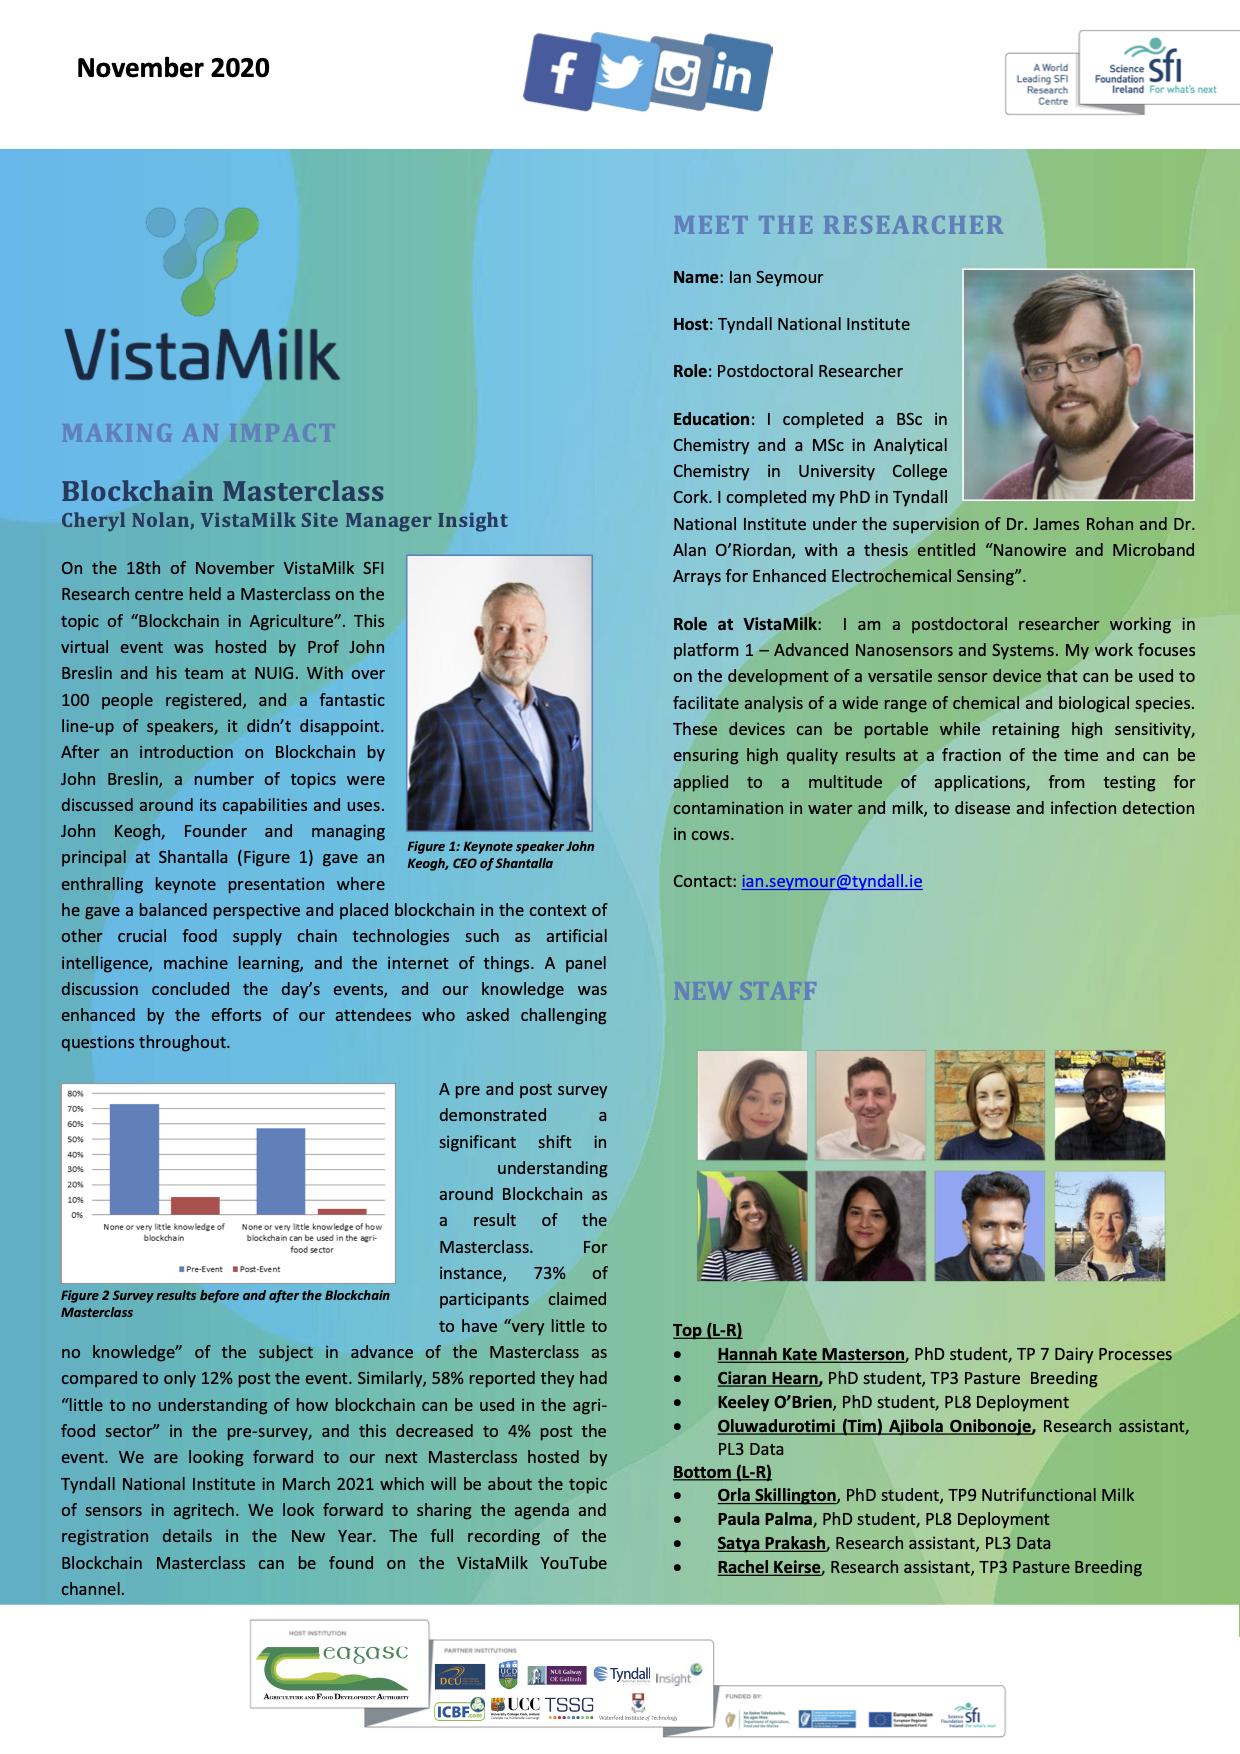 VistaMilk November 2020 Updates | VistaMilk